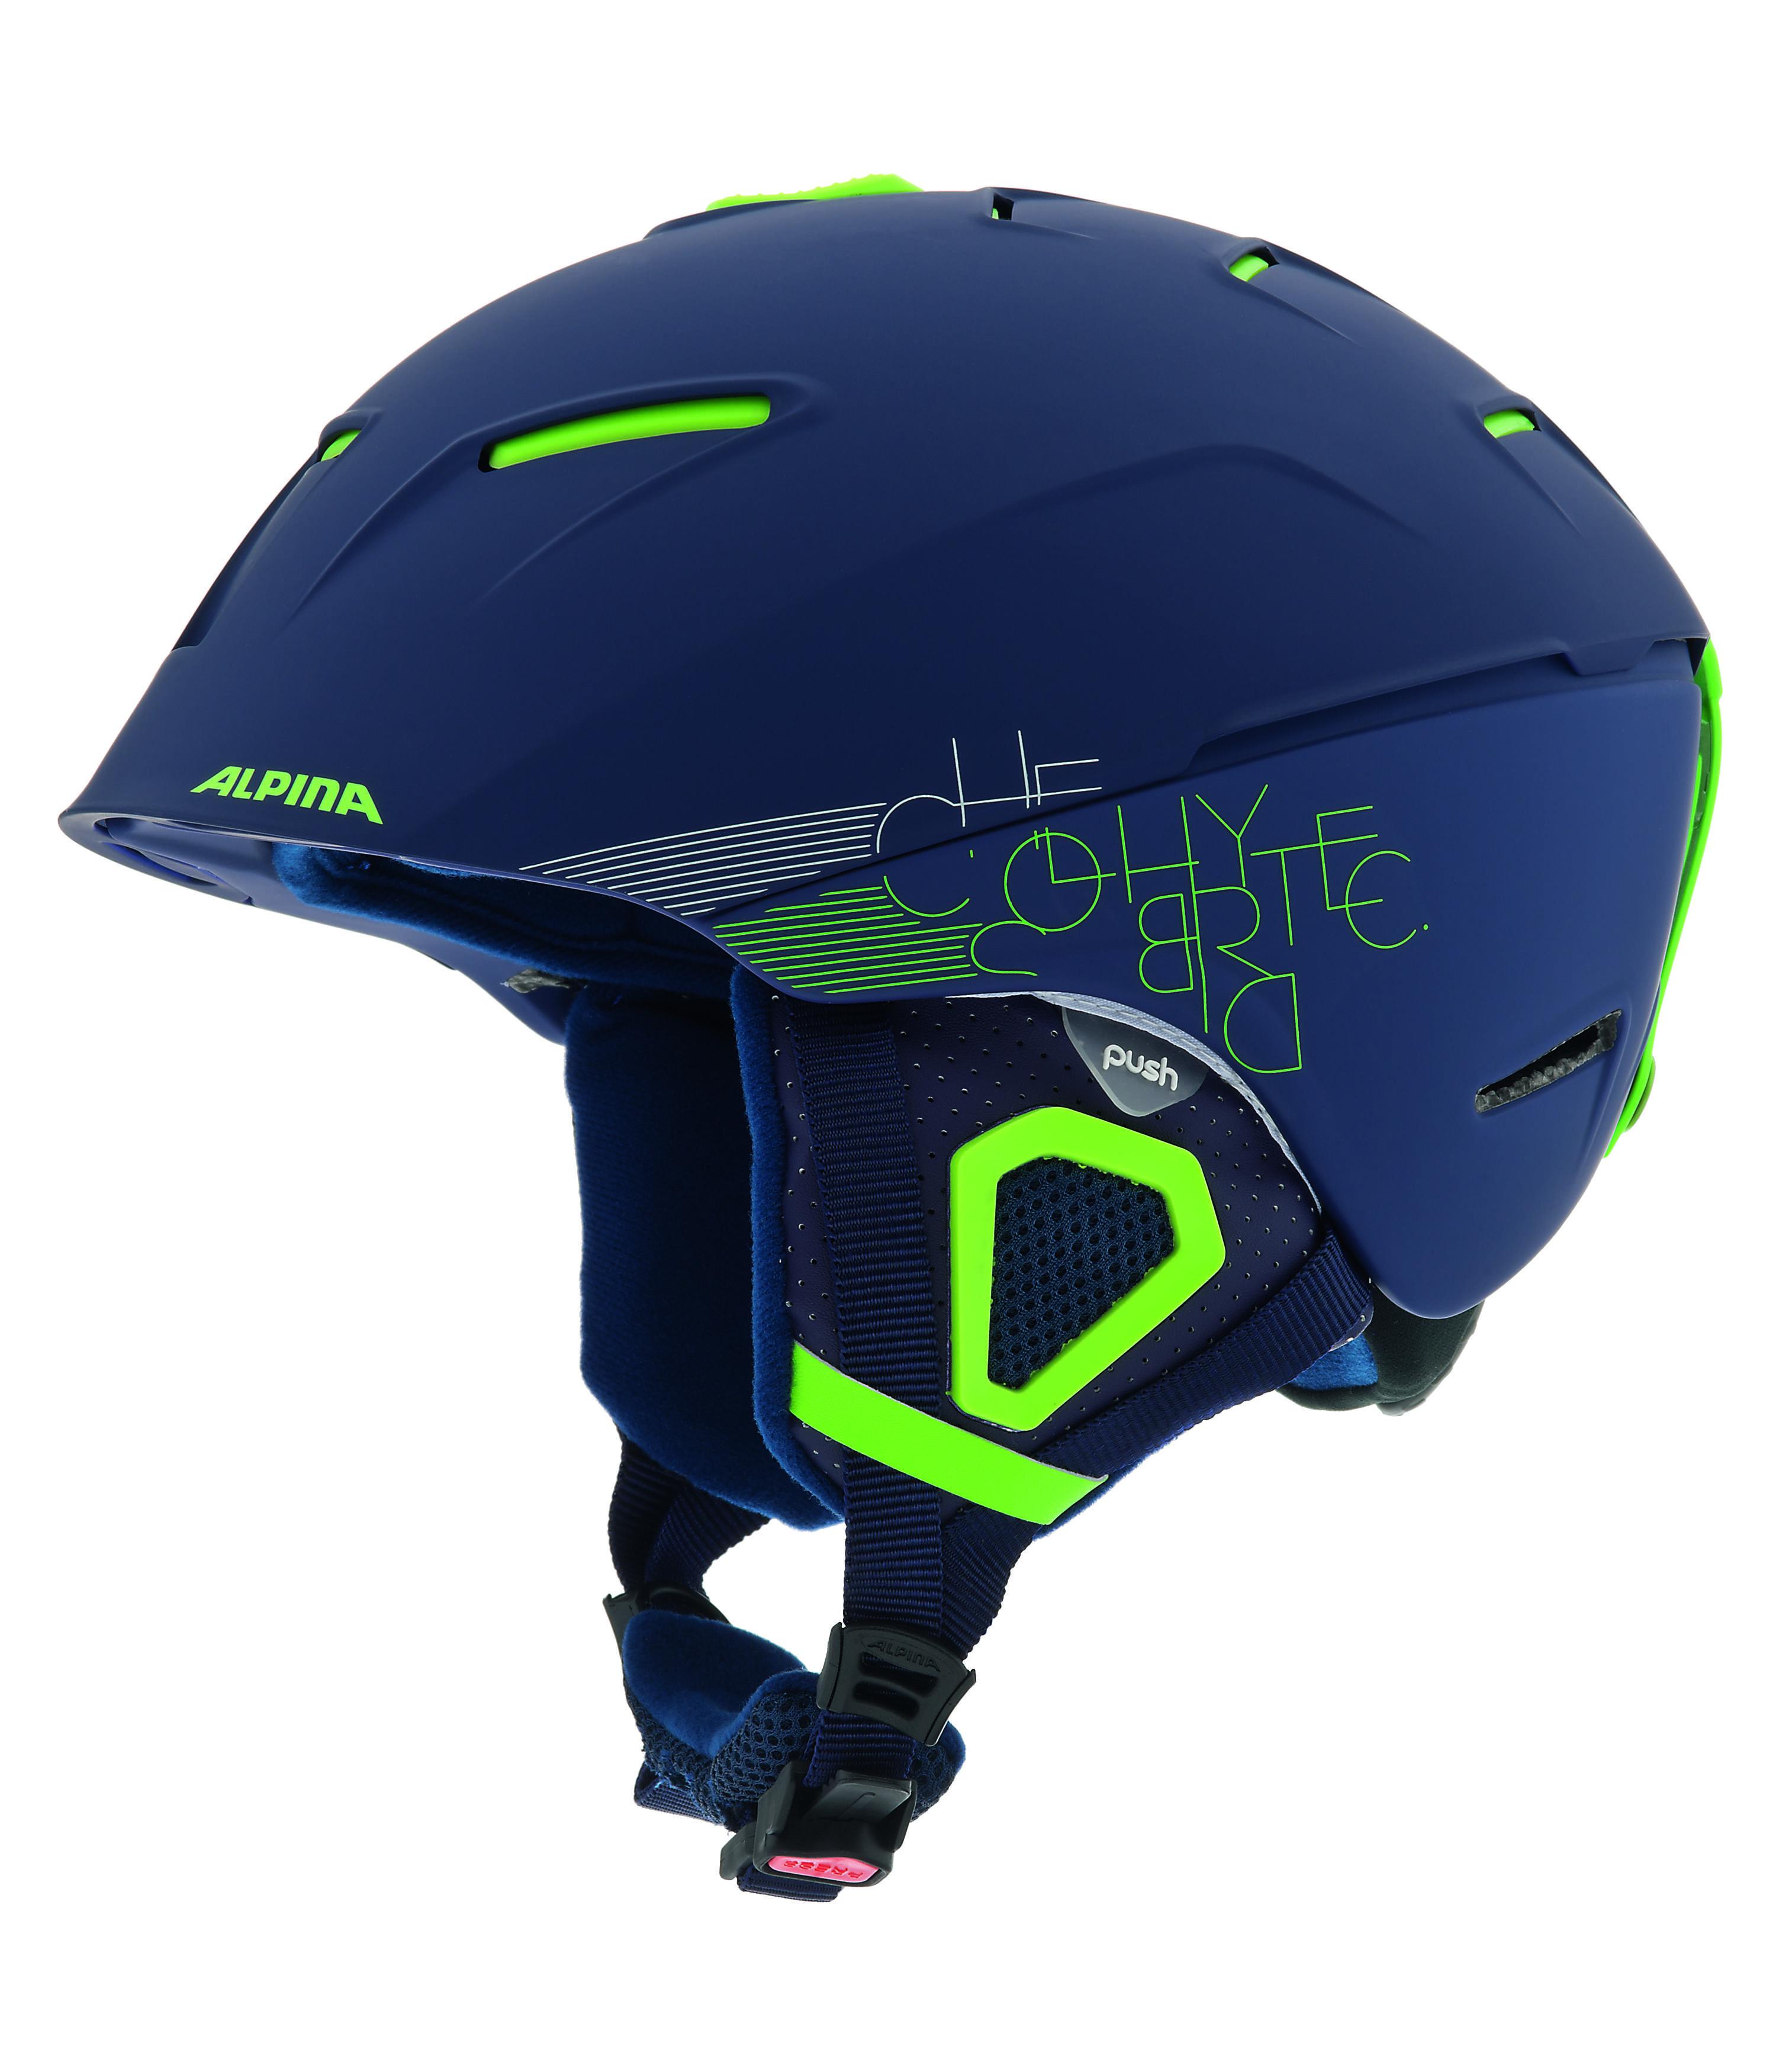 Зимний Шлем Alpina FREERIDE CHEOS navy matt (см:52-56) - артикул: 970850428